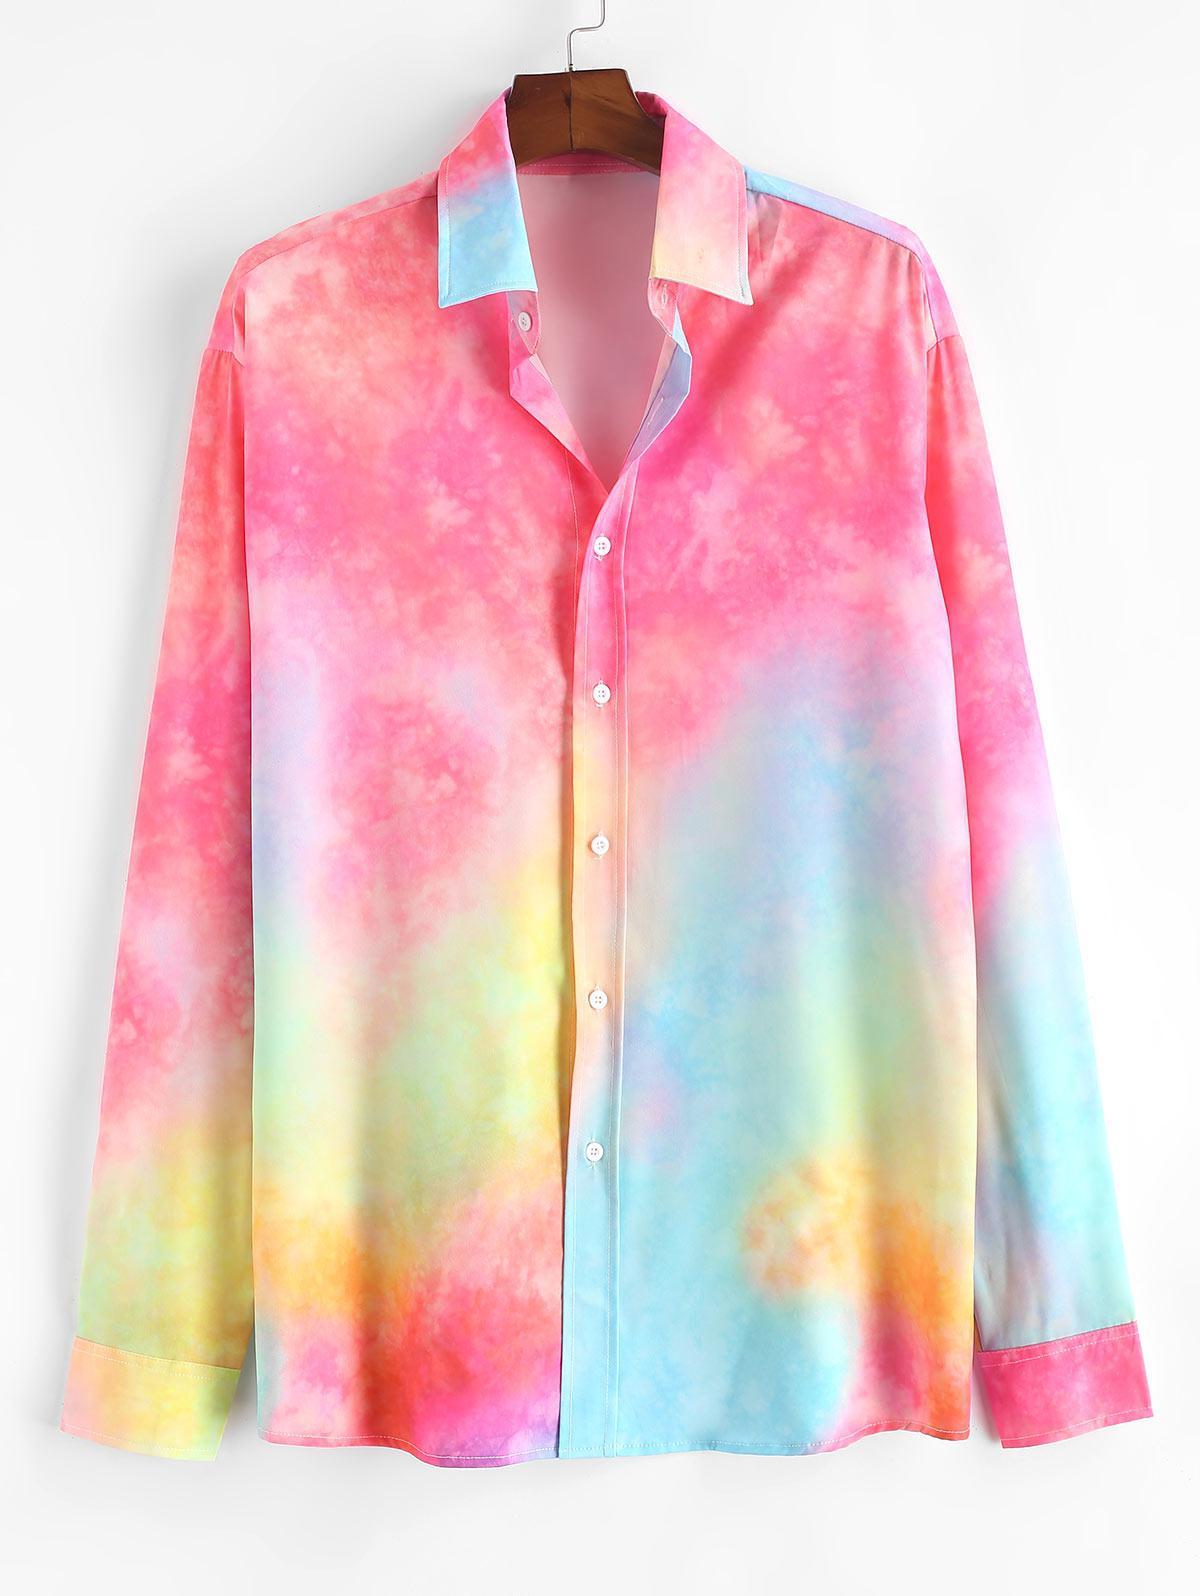 Chemise Colorée Teintée Imprimée Boutonnée - ZAFUL - Modalova